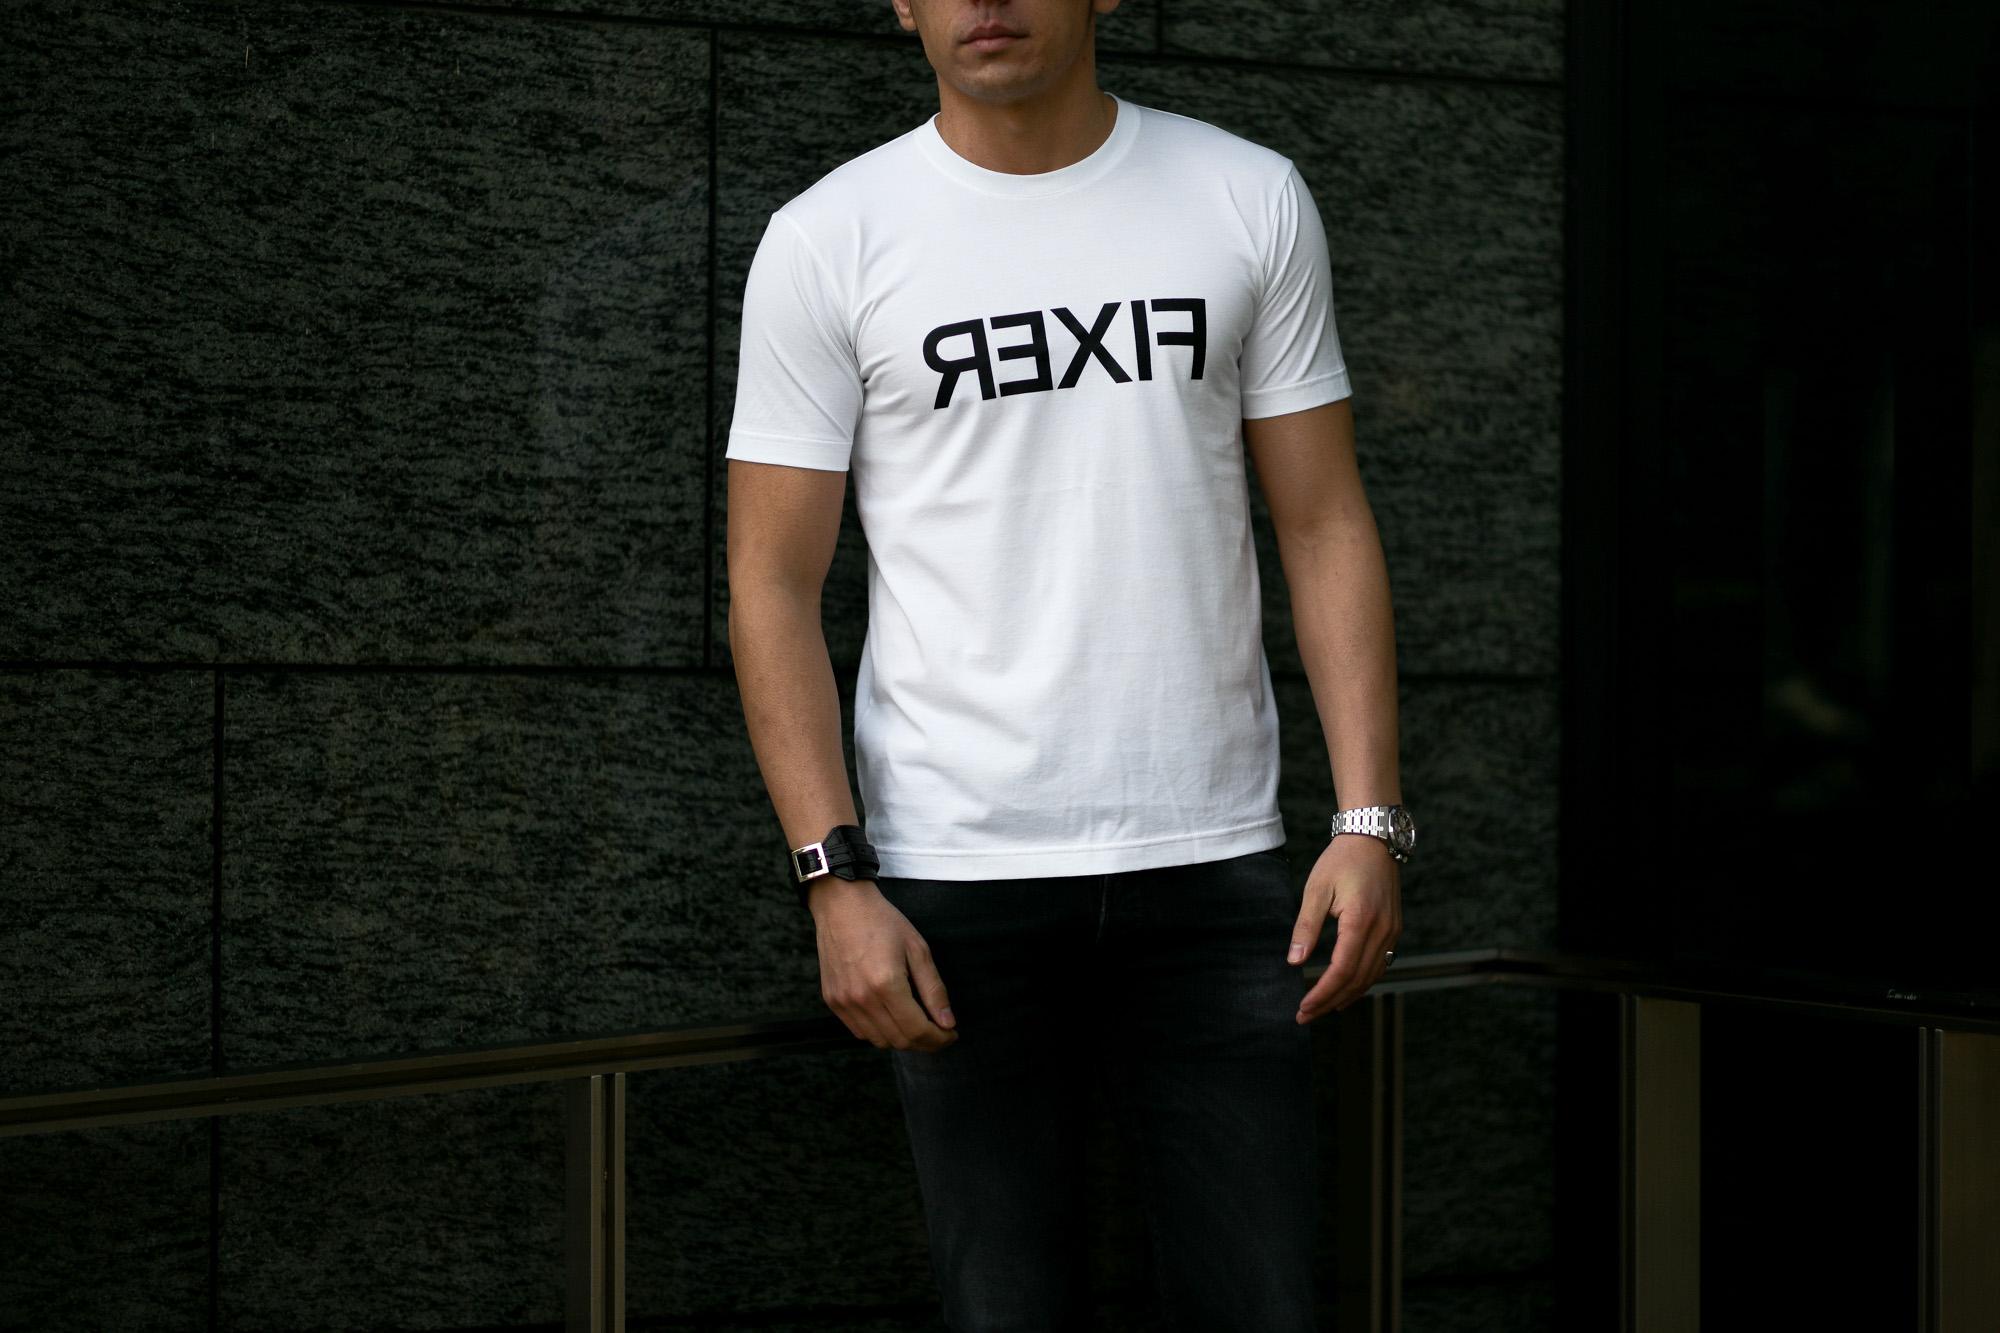 FIXER (フィクサー) FTS-03 Reverse Print Crew Neck T-shirt リバースプリント Tシャツ WHITE (ホワイト) 【ご予約受付中】【2021.2.15(Tue)~2021.2.28(Sun)】 愛知 名古屋 Alto e Diritto altoediritto アルトエデリット Tシャツ